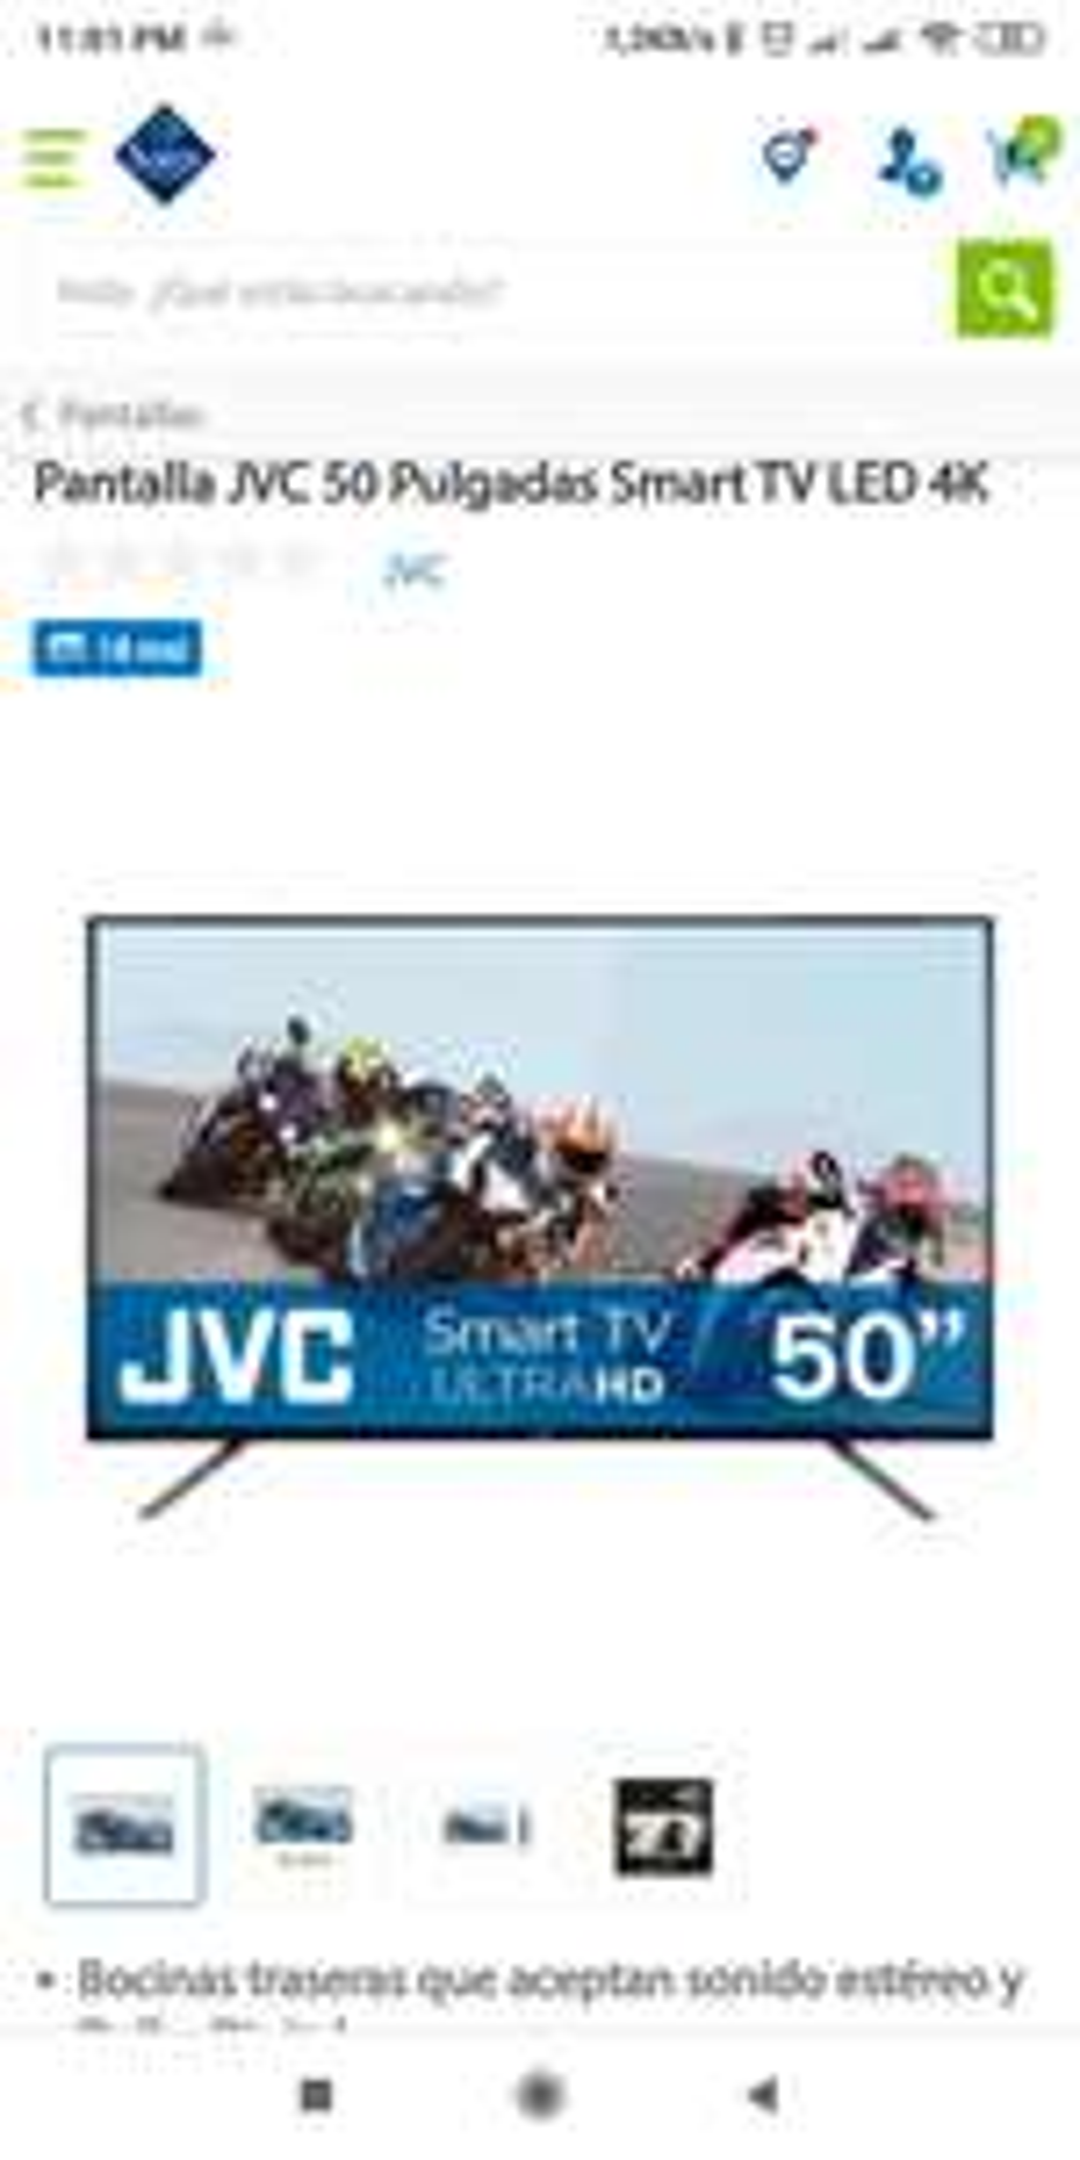 Sam's Club Pantalla JVC 50 pulgadas Smart TV 4K UHD